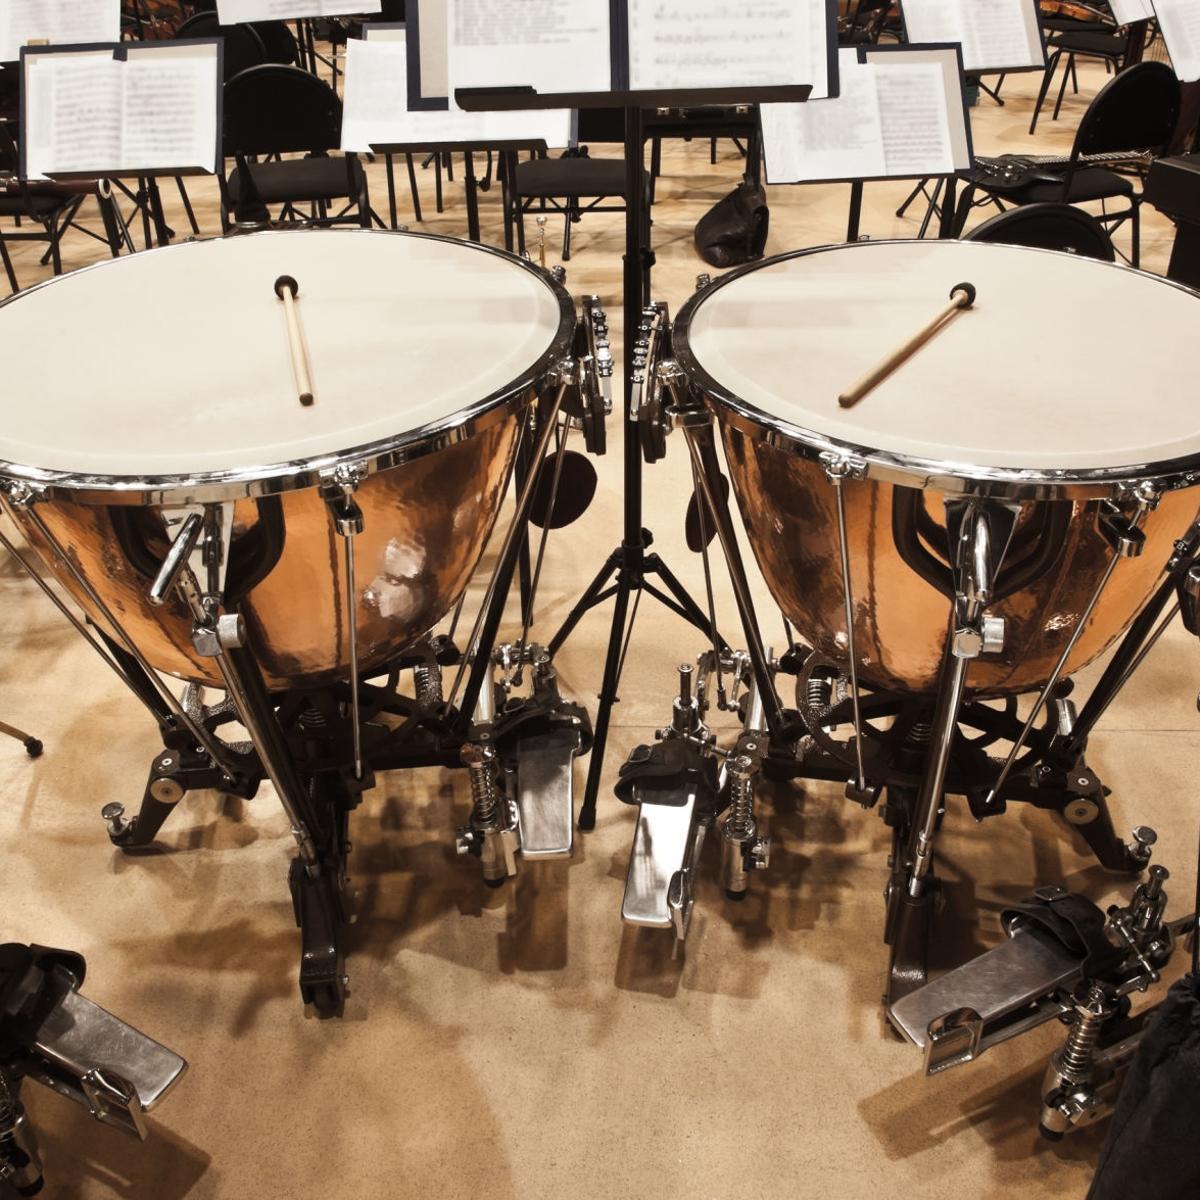 After marathon 13-hour audition, Tucson Symphony Orchestra